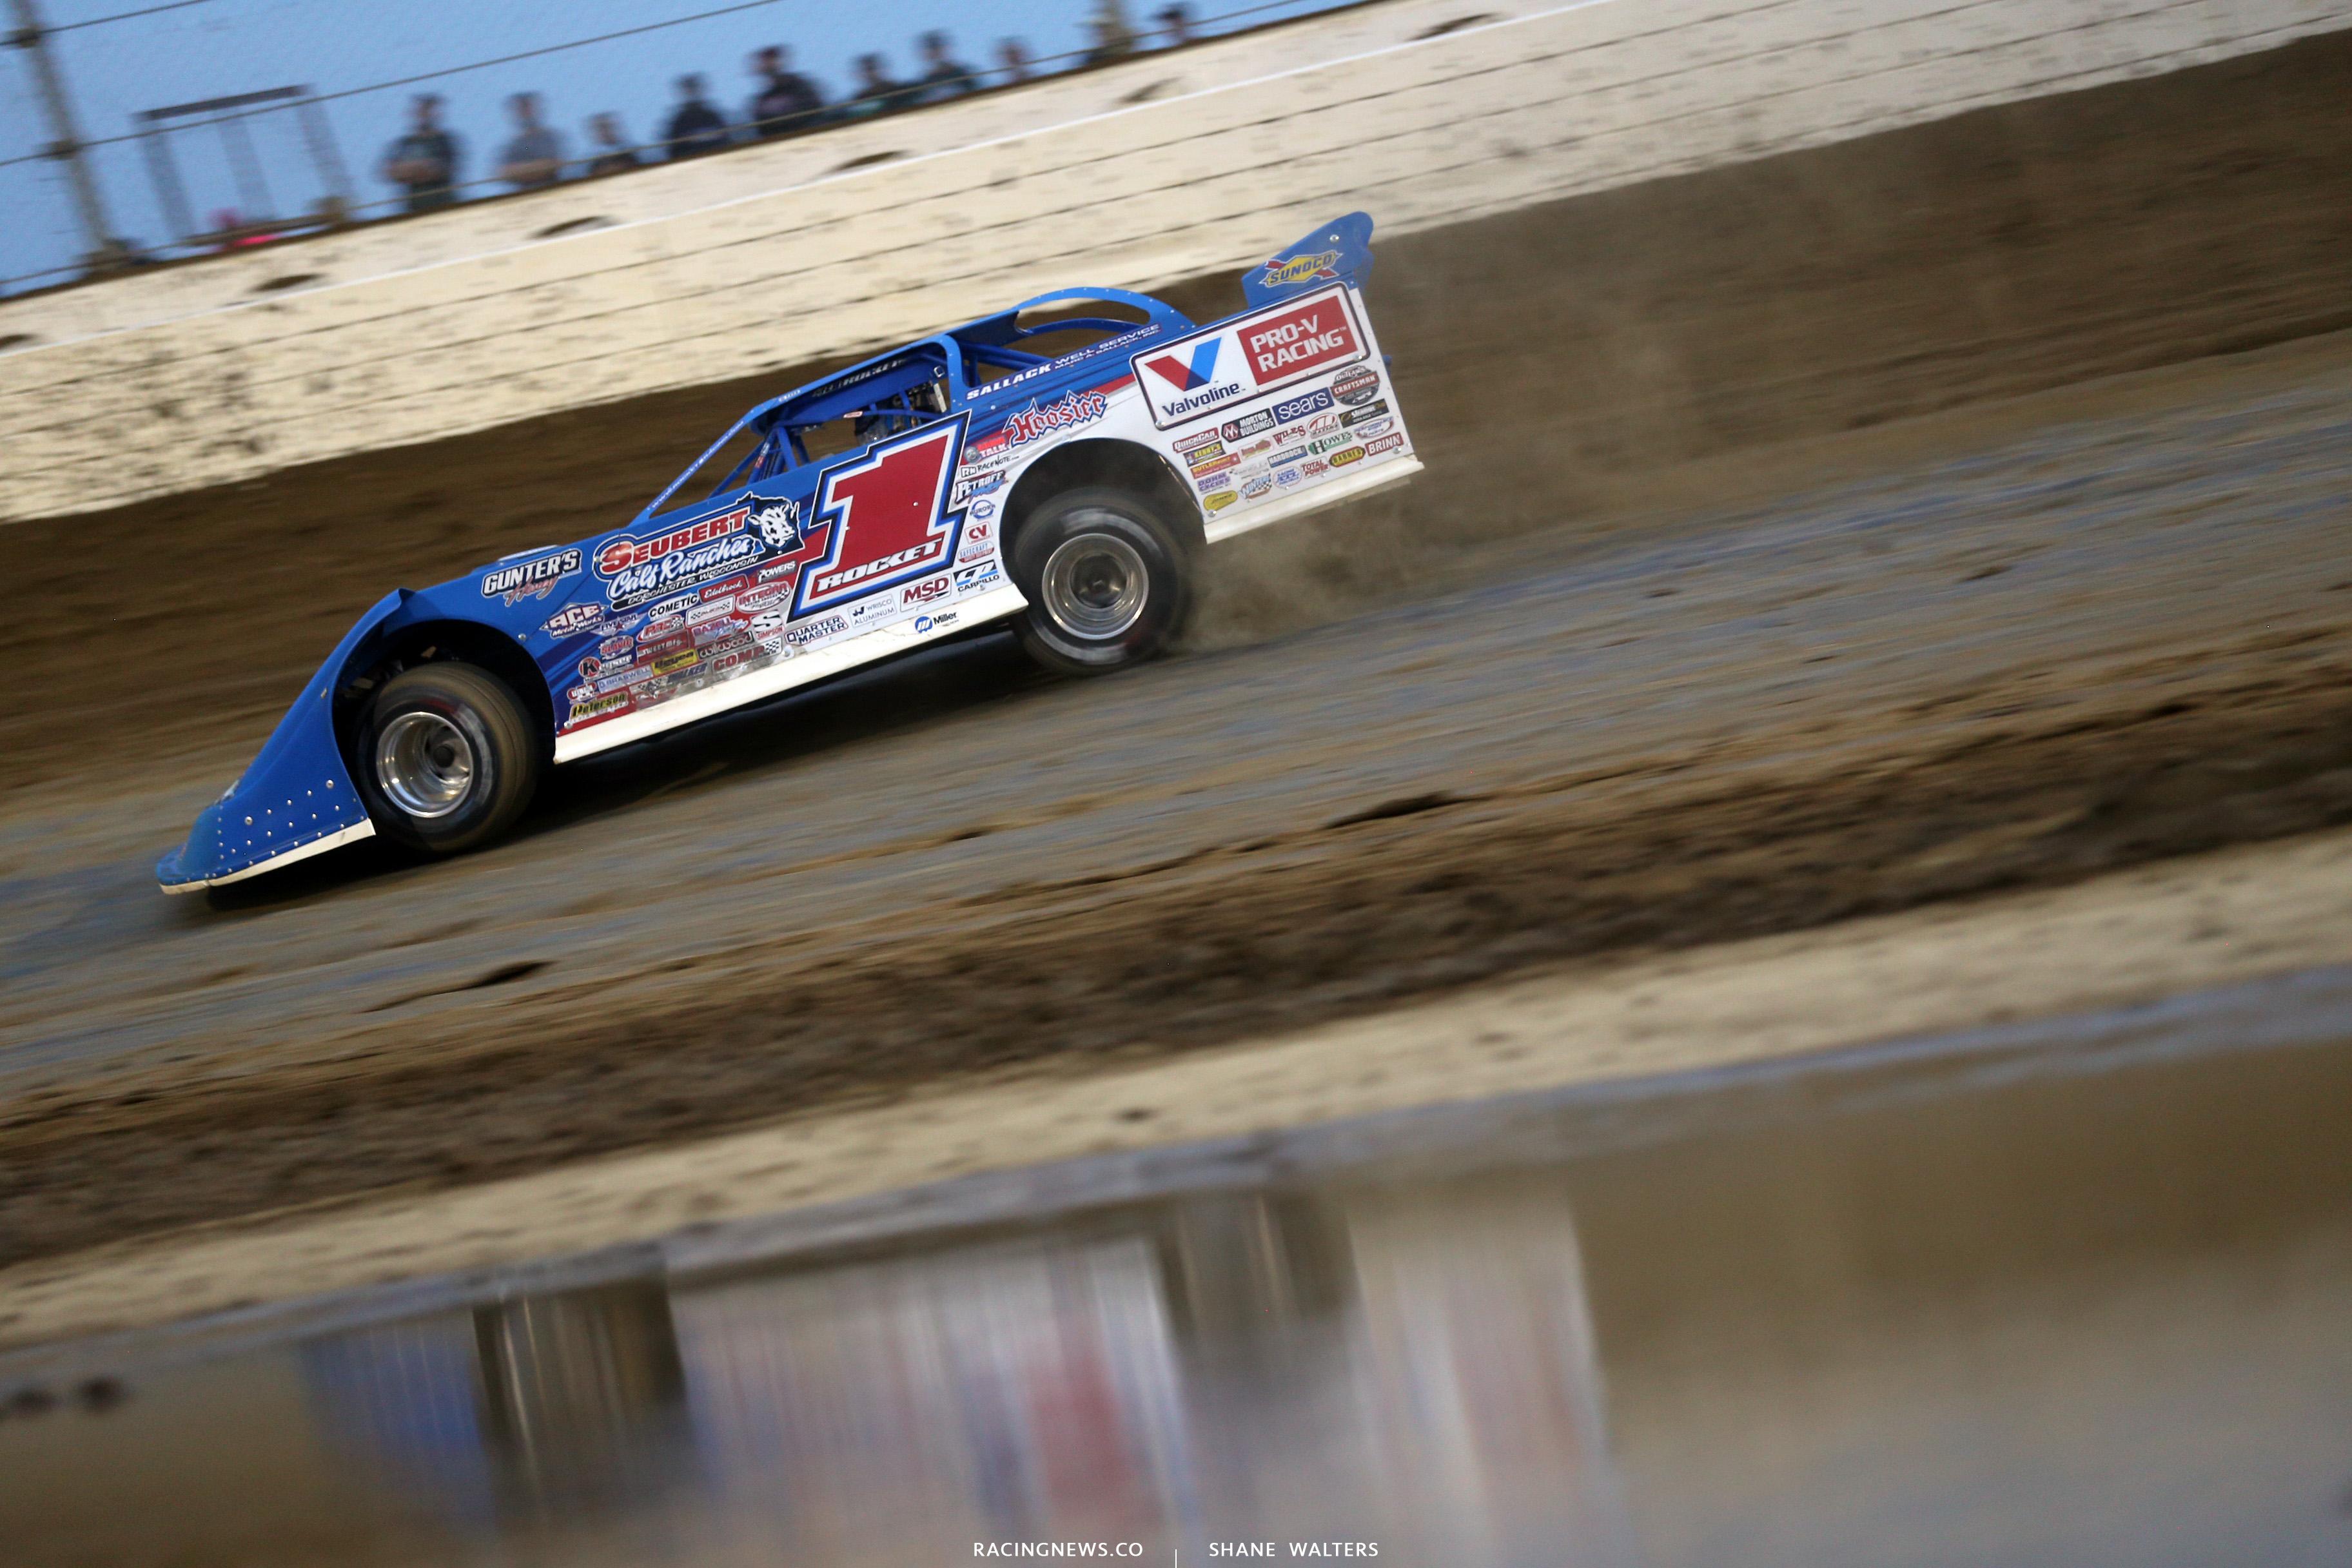 Brandon Sheppard at Mansfield Motor Speedway in the Dirt Million 6428